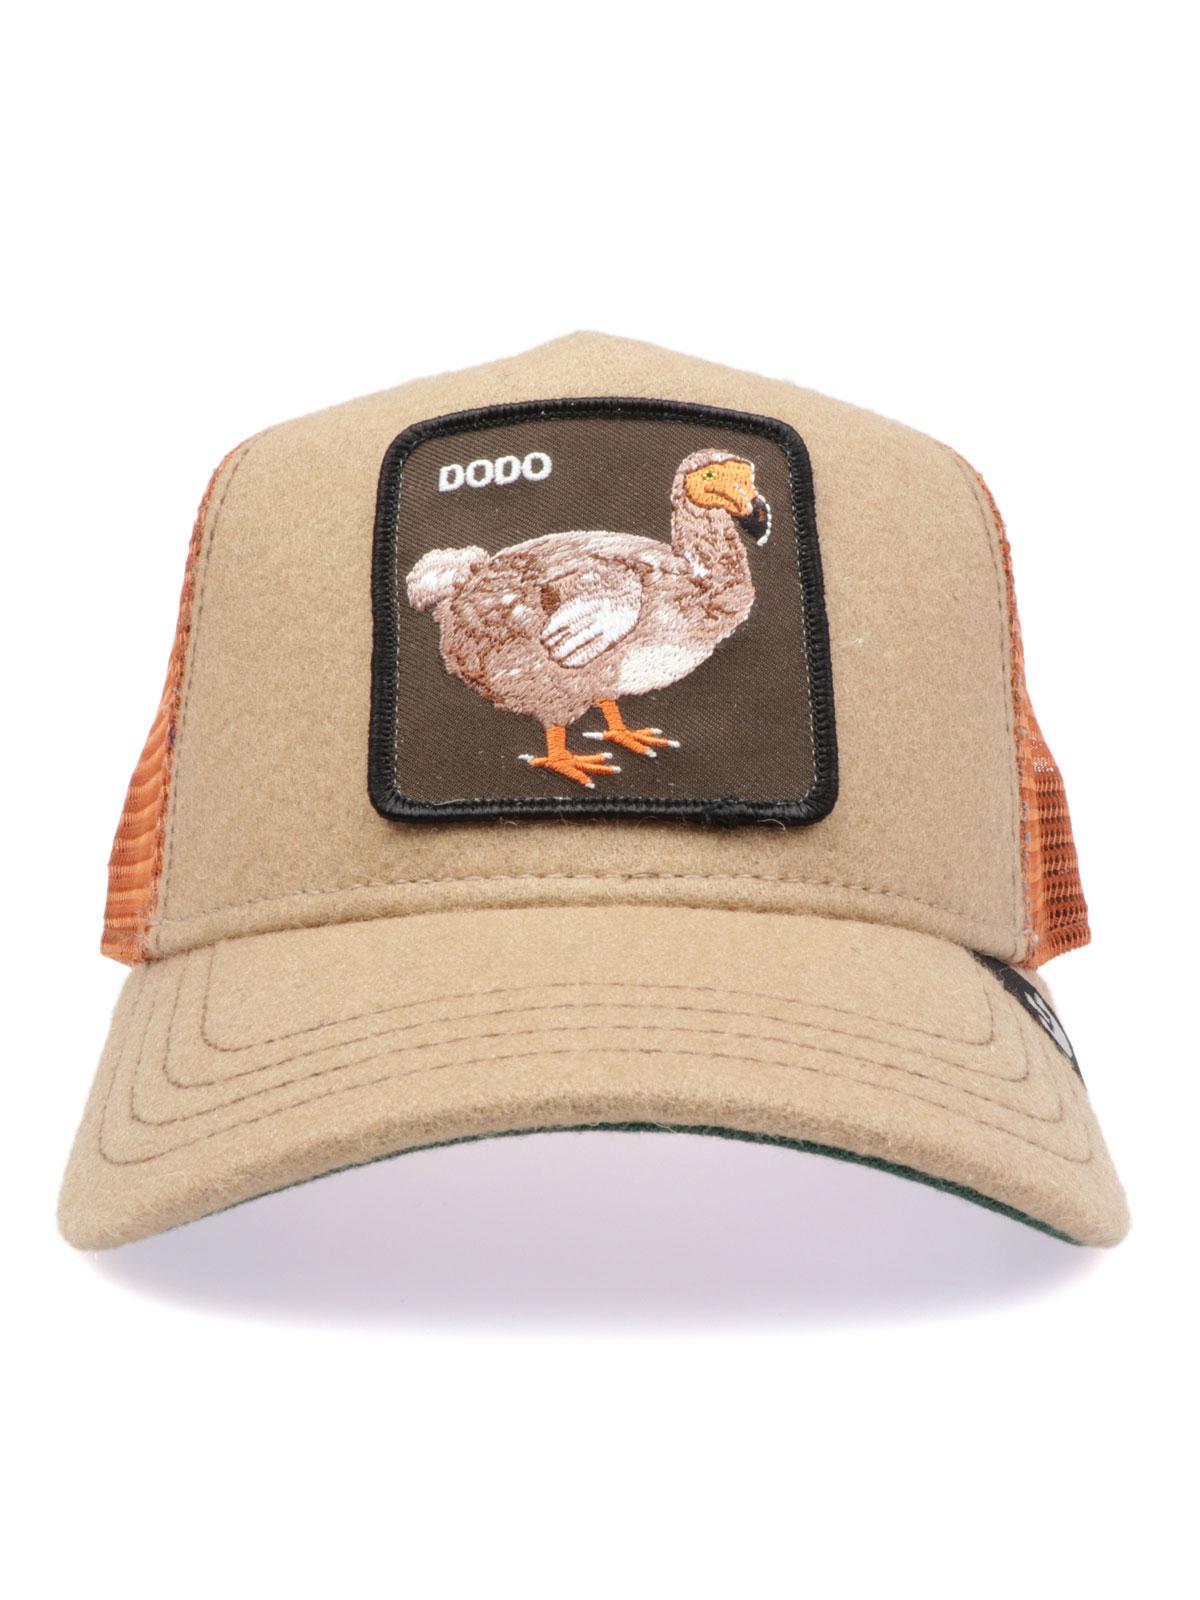 Picture of GOORIN BROS | Dodo Trucker Hat